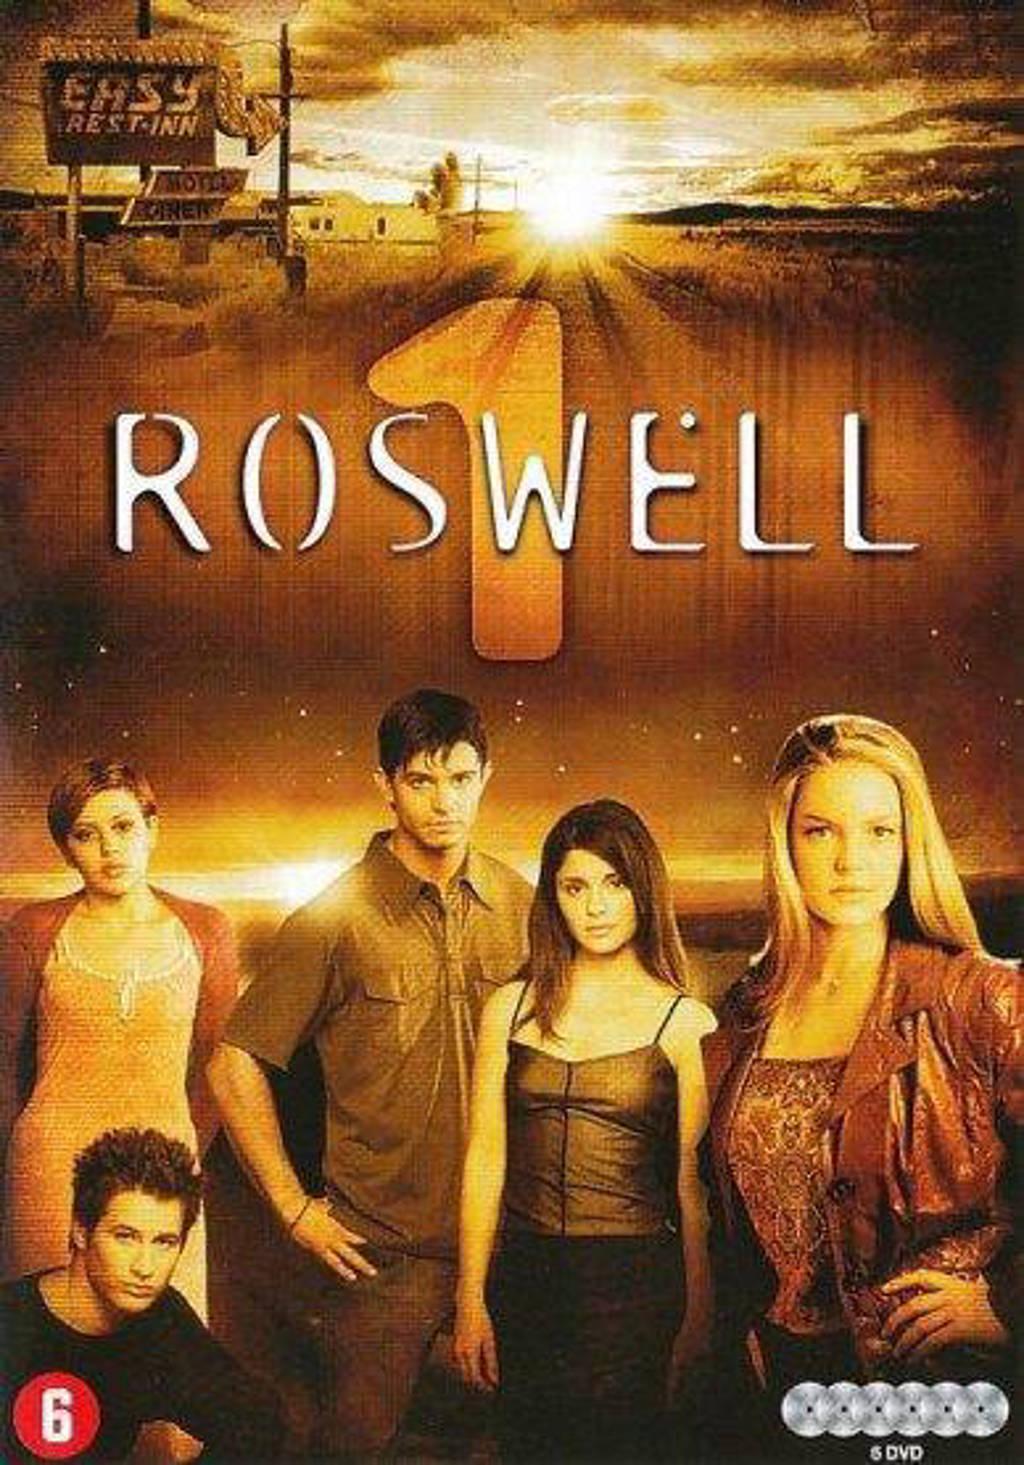 Roswell - Seizoen 1 (DVD)